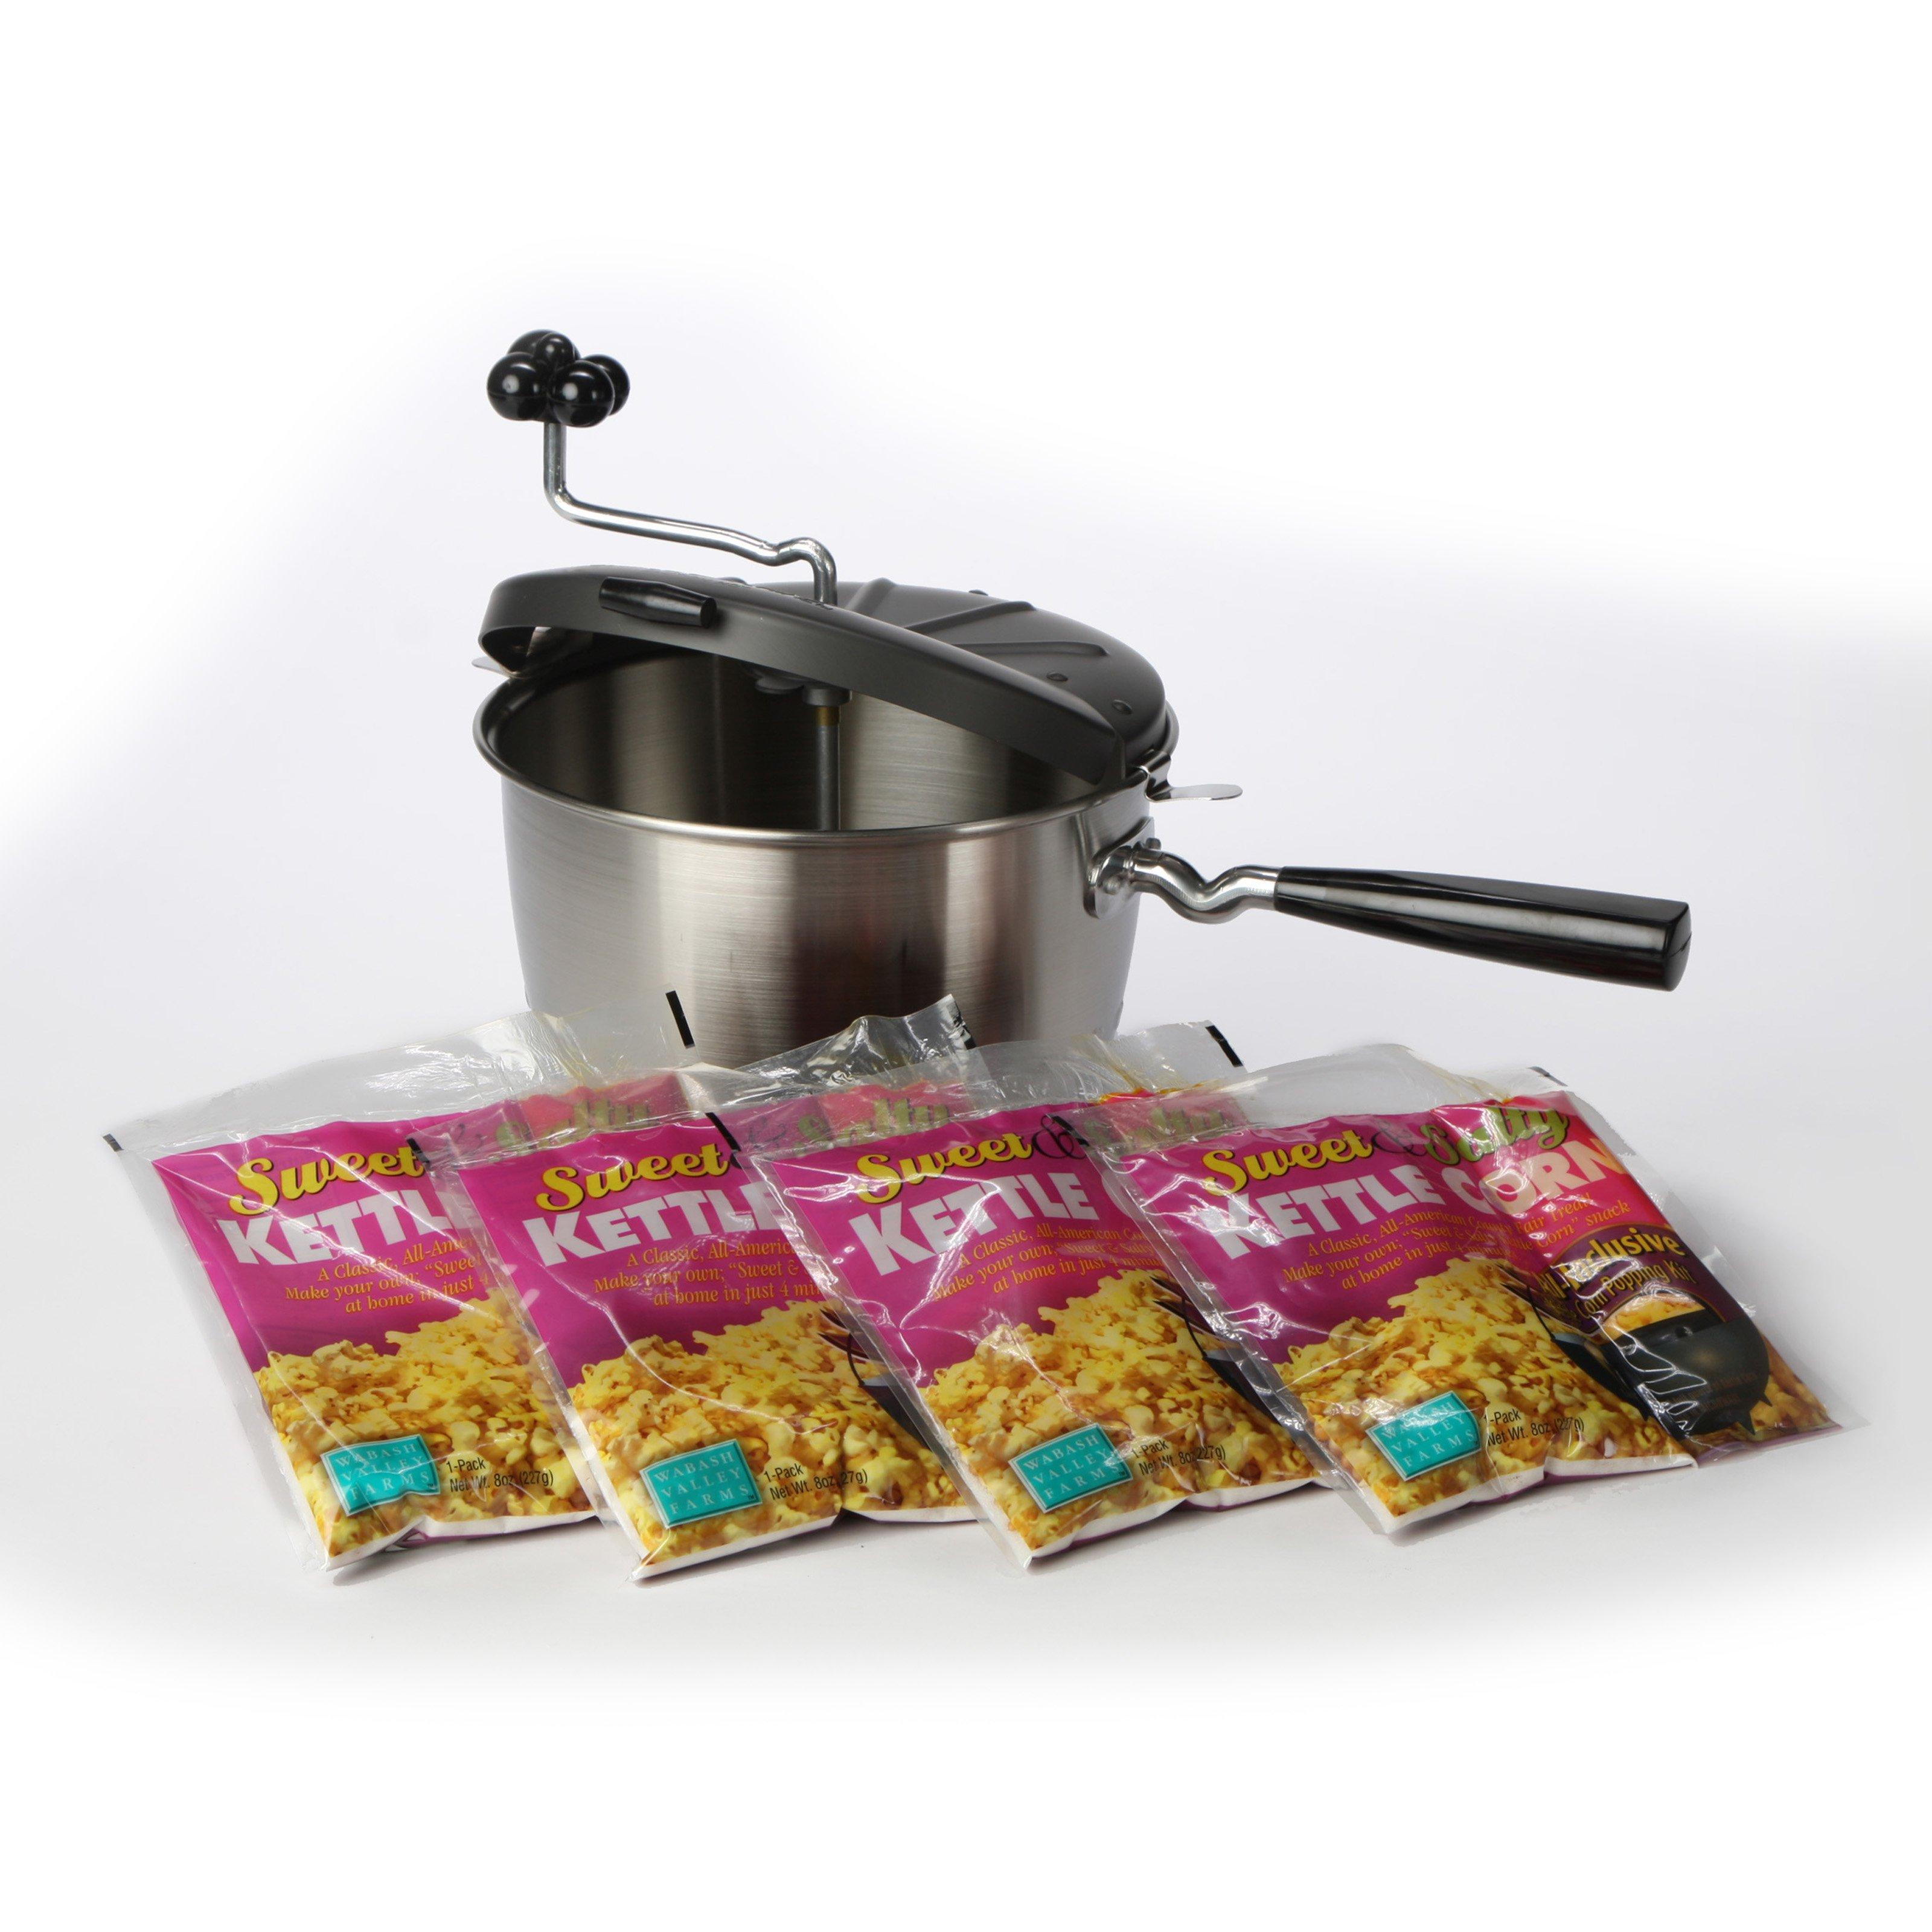 Wabash Valley Farms 50018 Sweet & Easy Kettle Corn Set